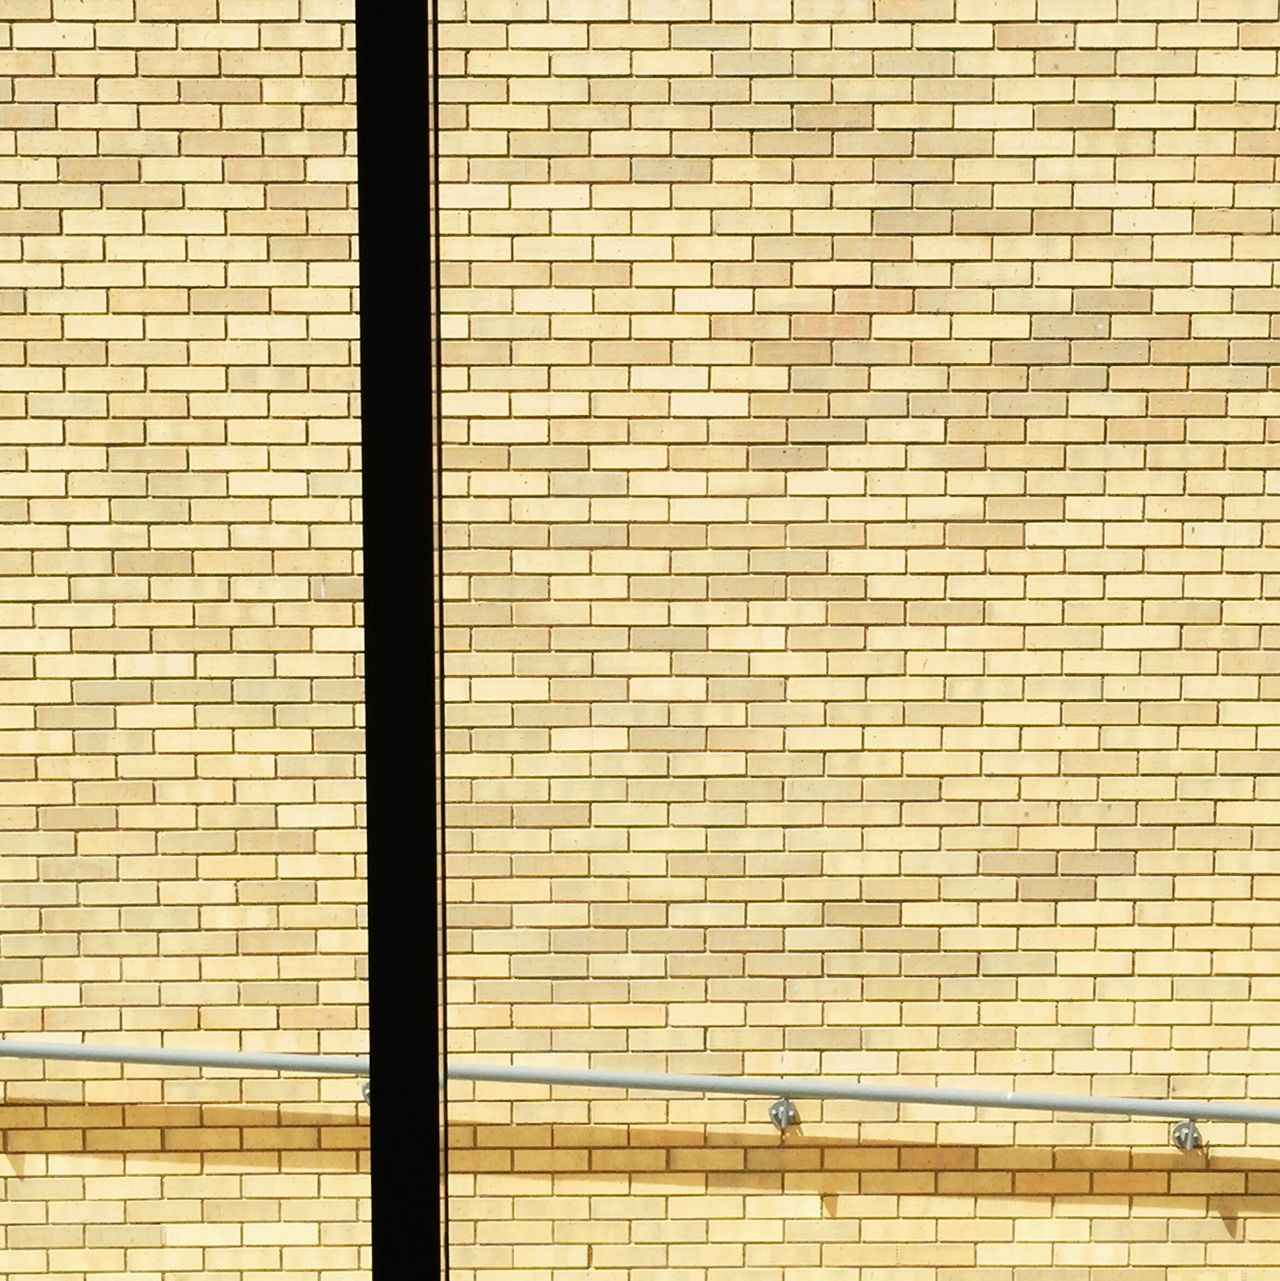 Brick Wall Bricks Wall Wall - Building Feature Kingston Kingston Upon Thames Kingston University EyeEm Gallery EyeEm Best Edits London Eye4photography  Building Exterior